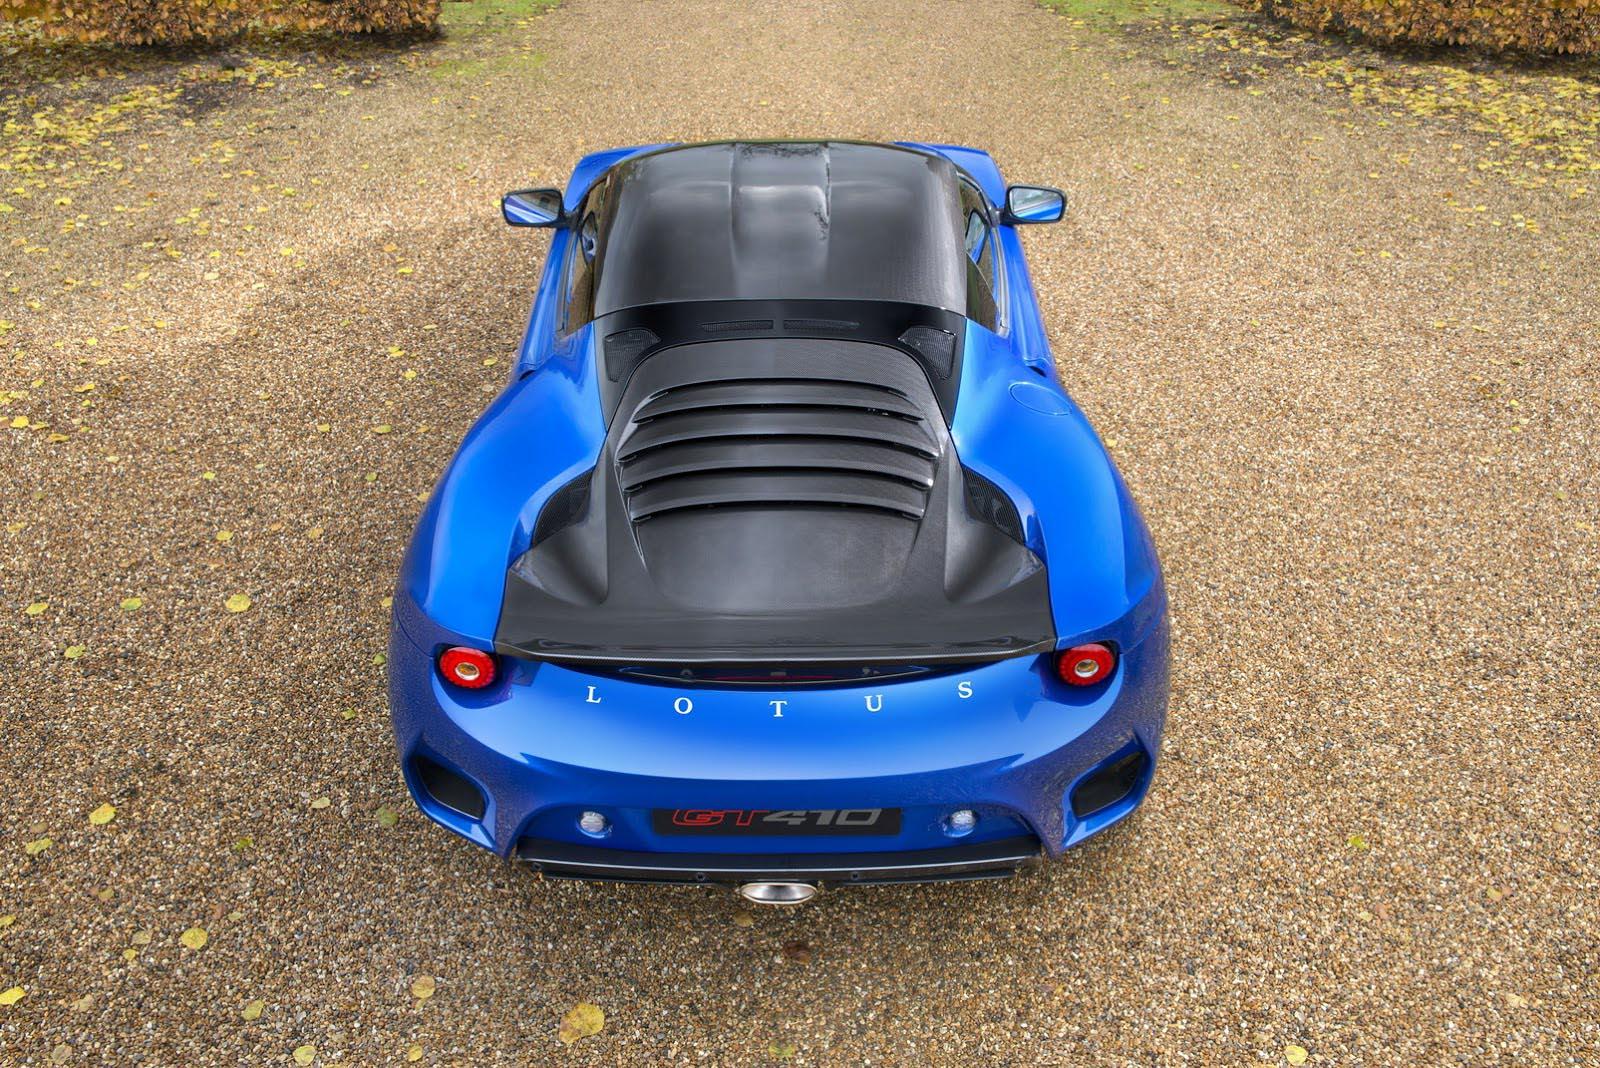 Photo of Η Lotus GT410 παίρνει την σκυτάλη από την Evora Sport 410